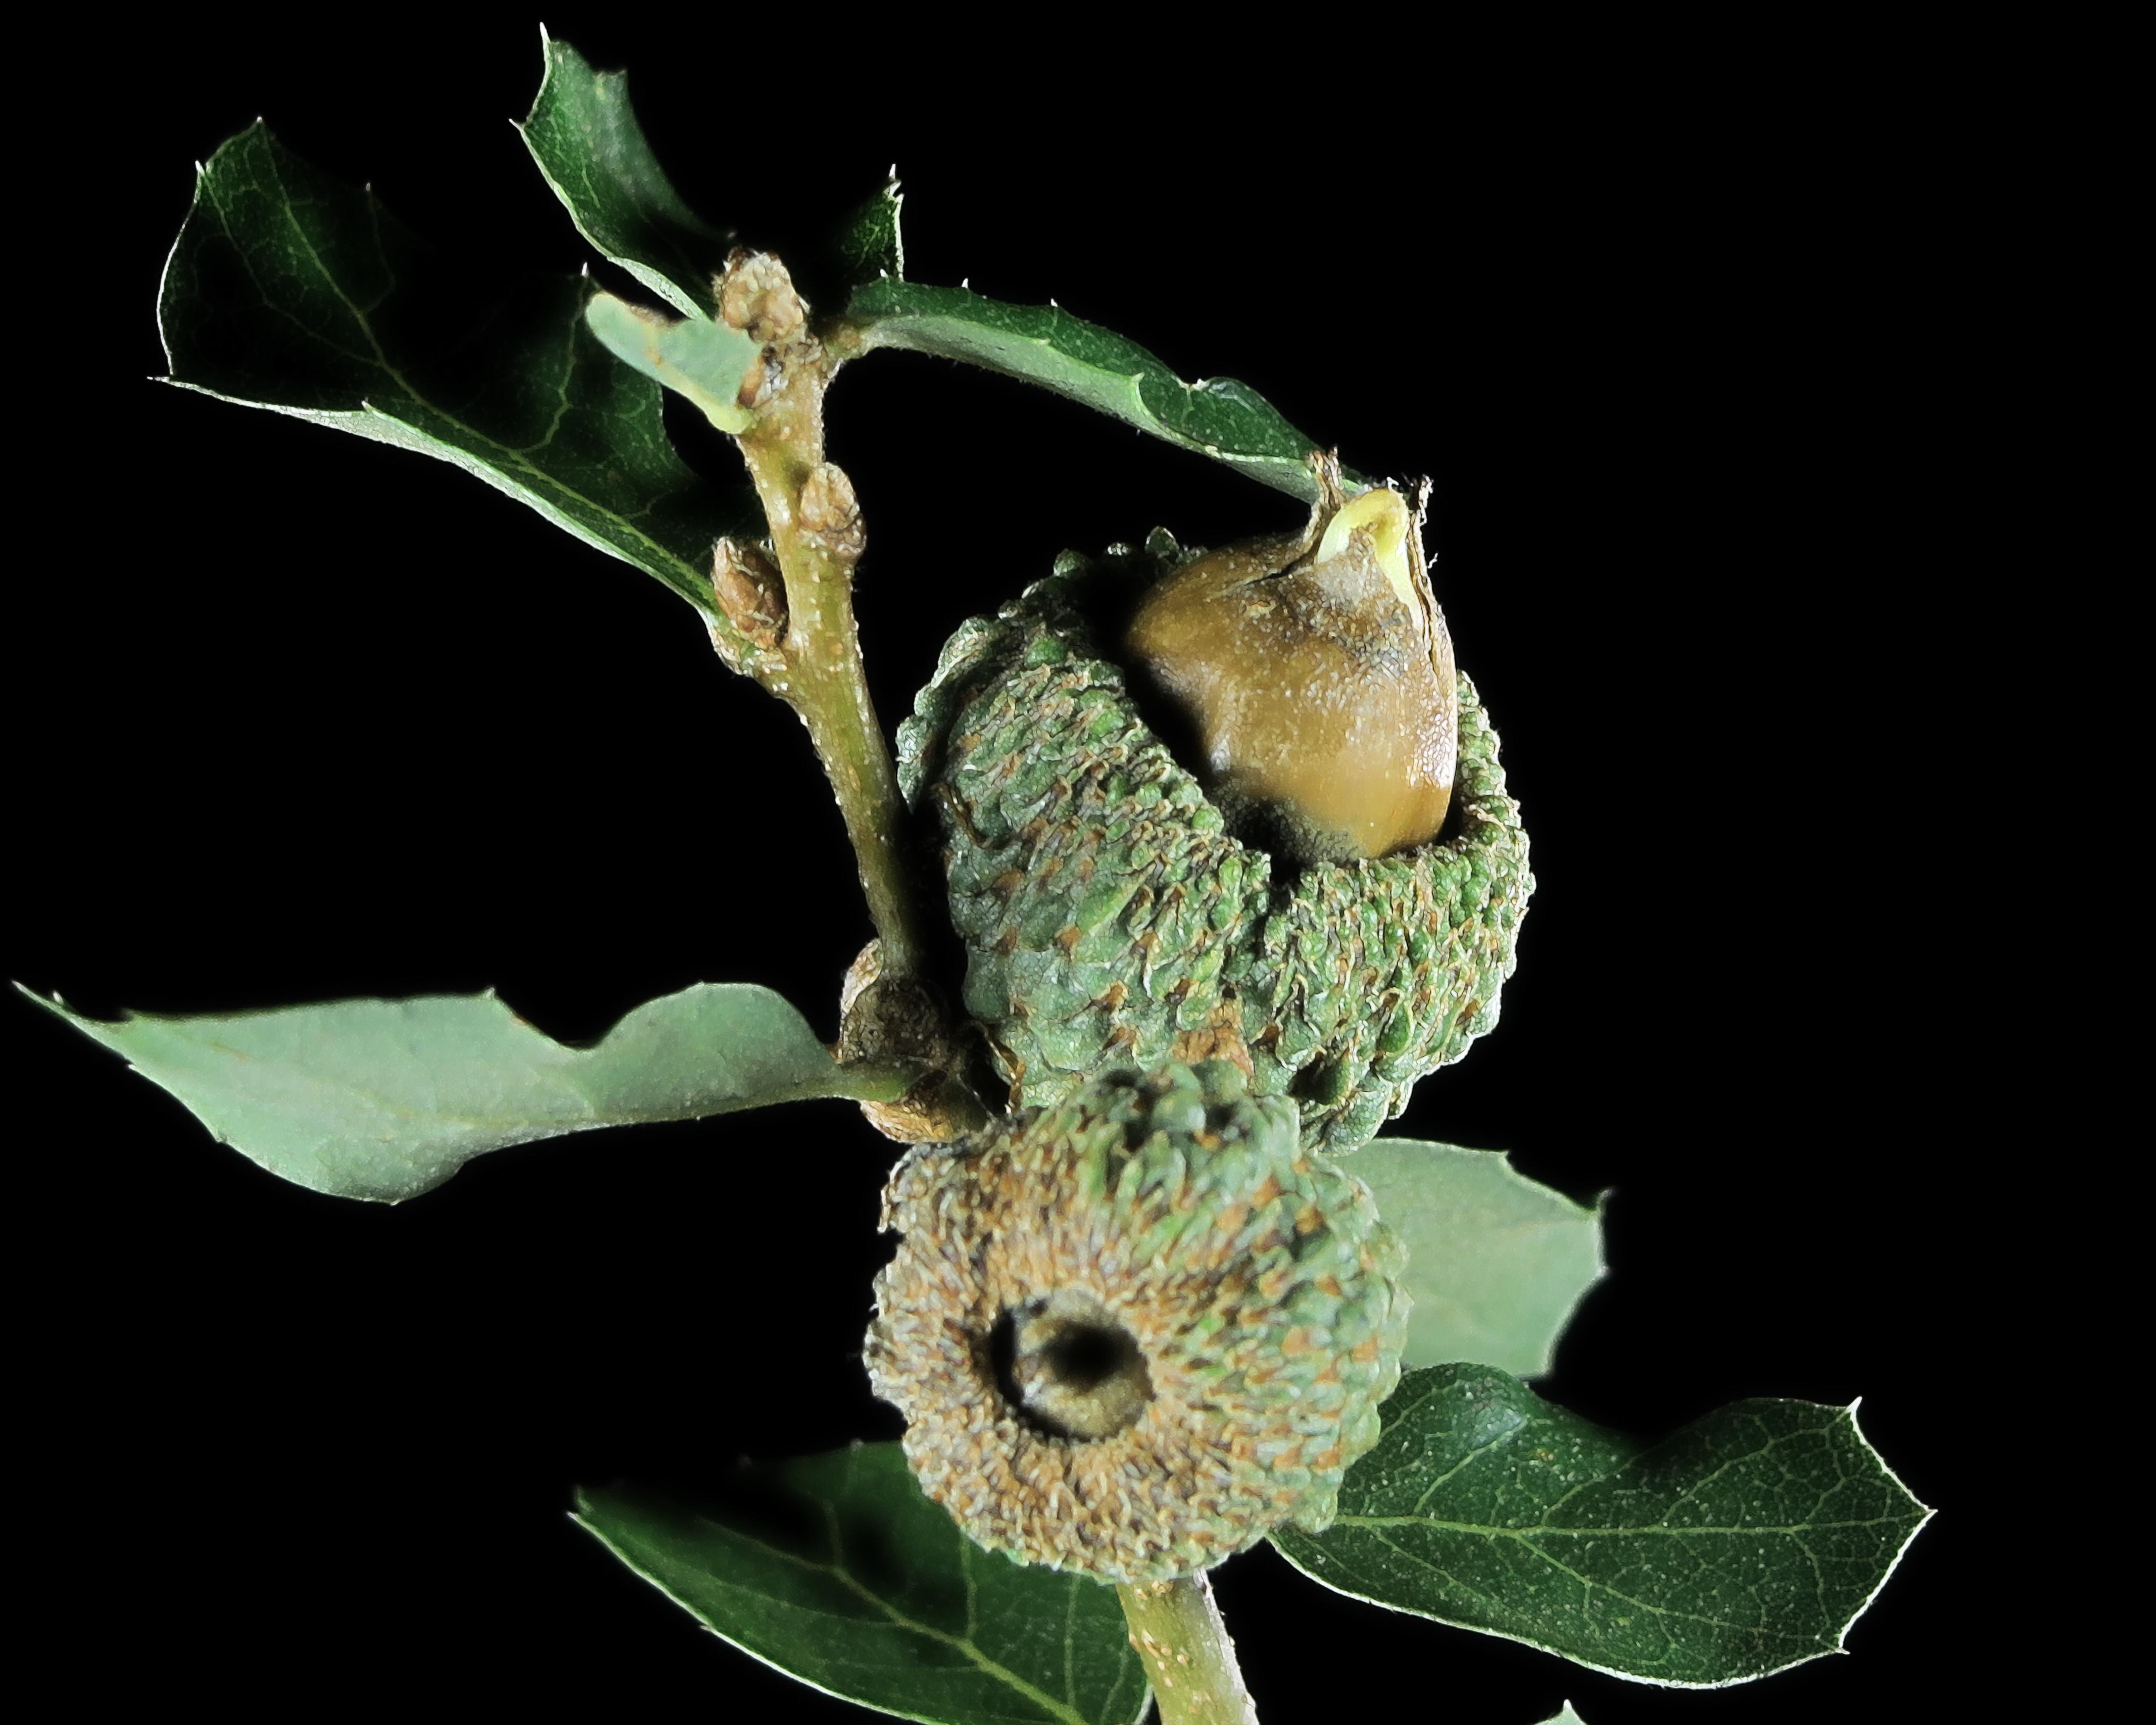 Image of Channel Island Scrub Oak